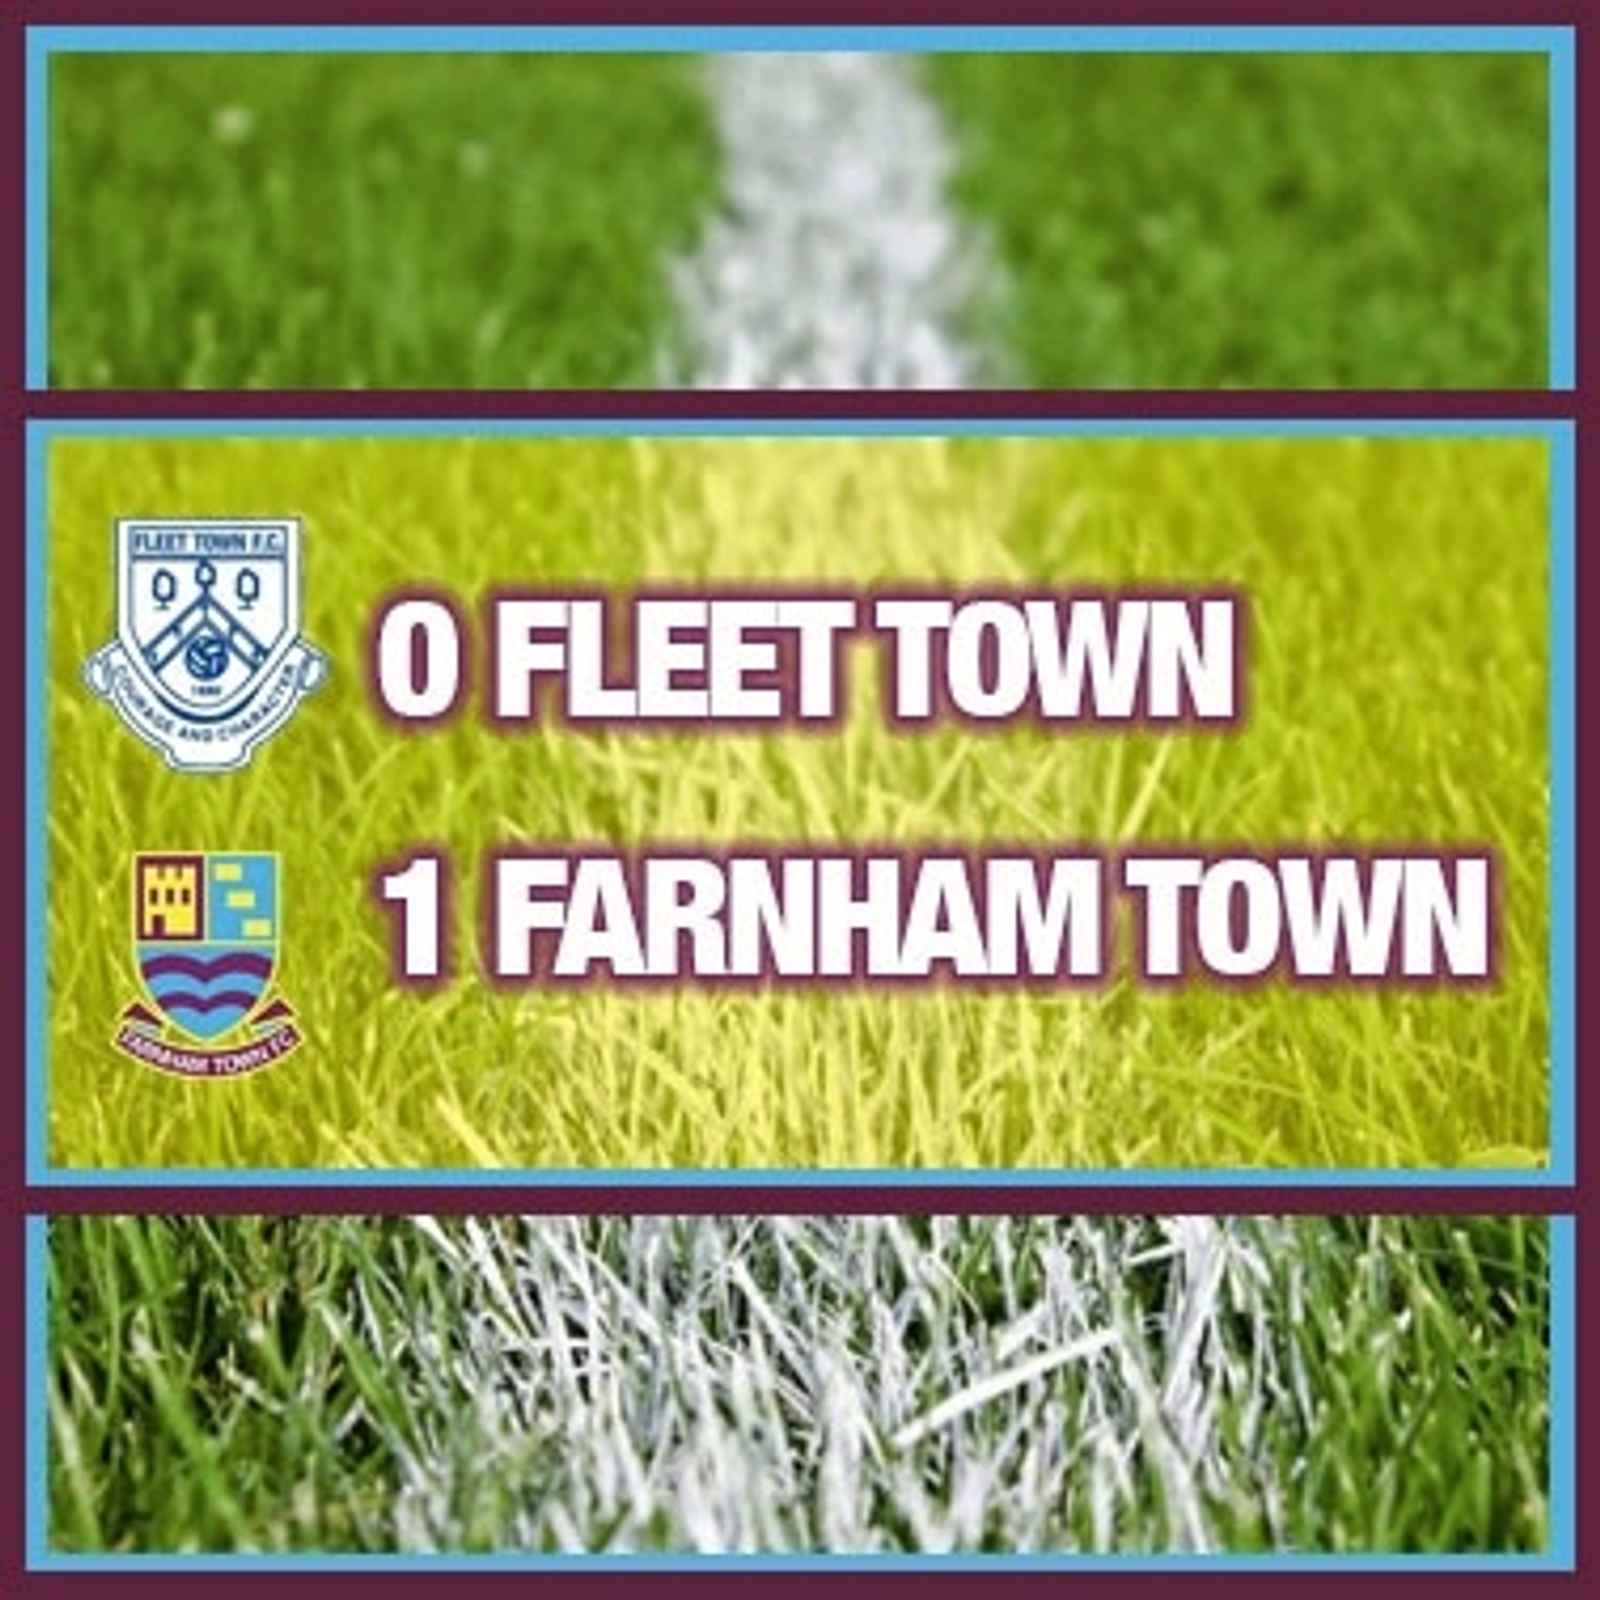 Fleet Town 0-1 Farnham Town